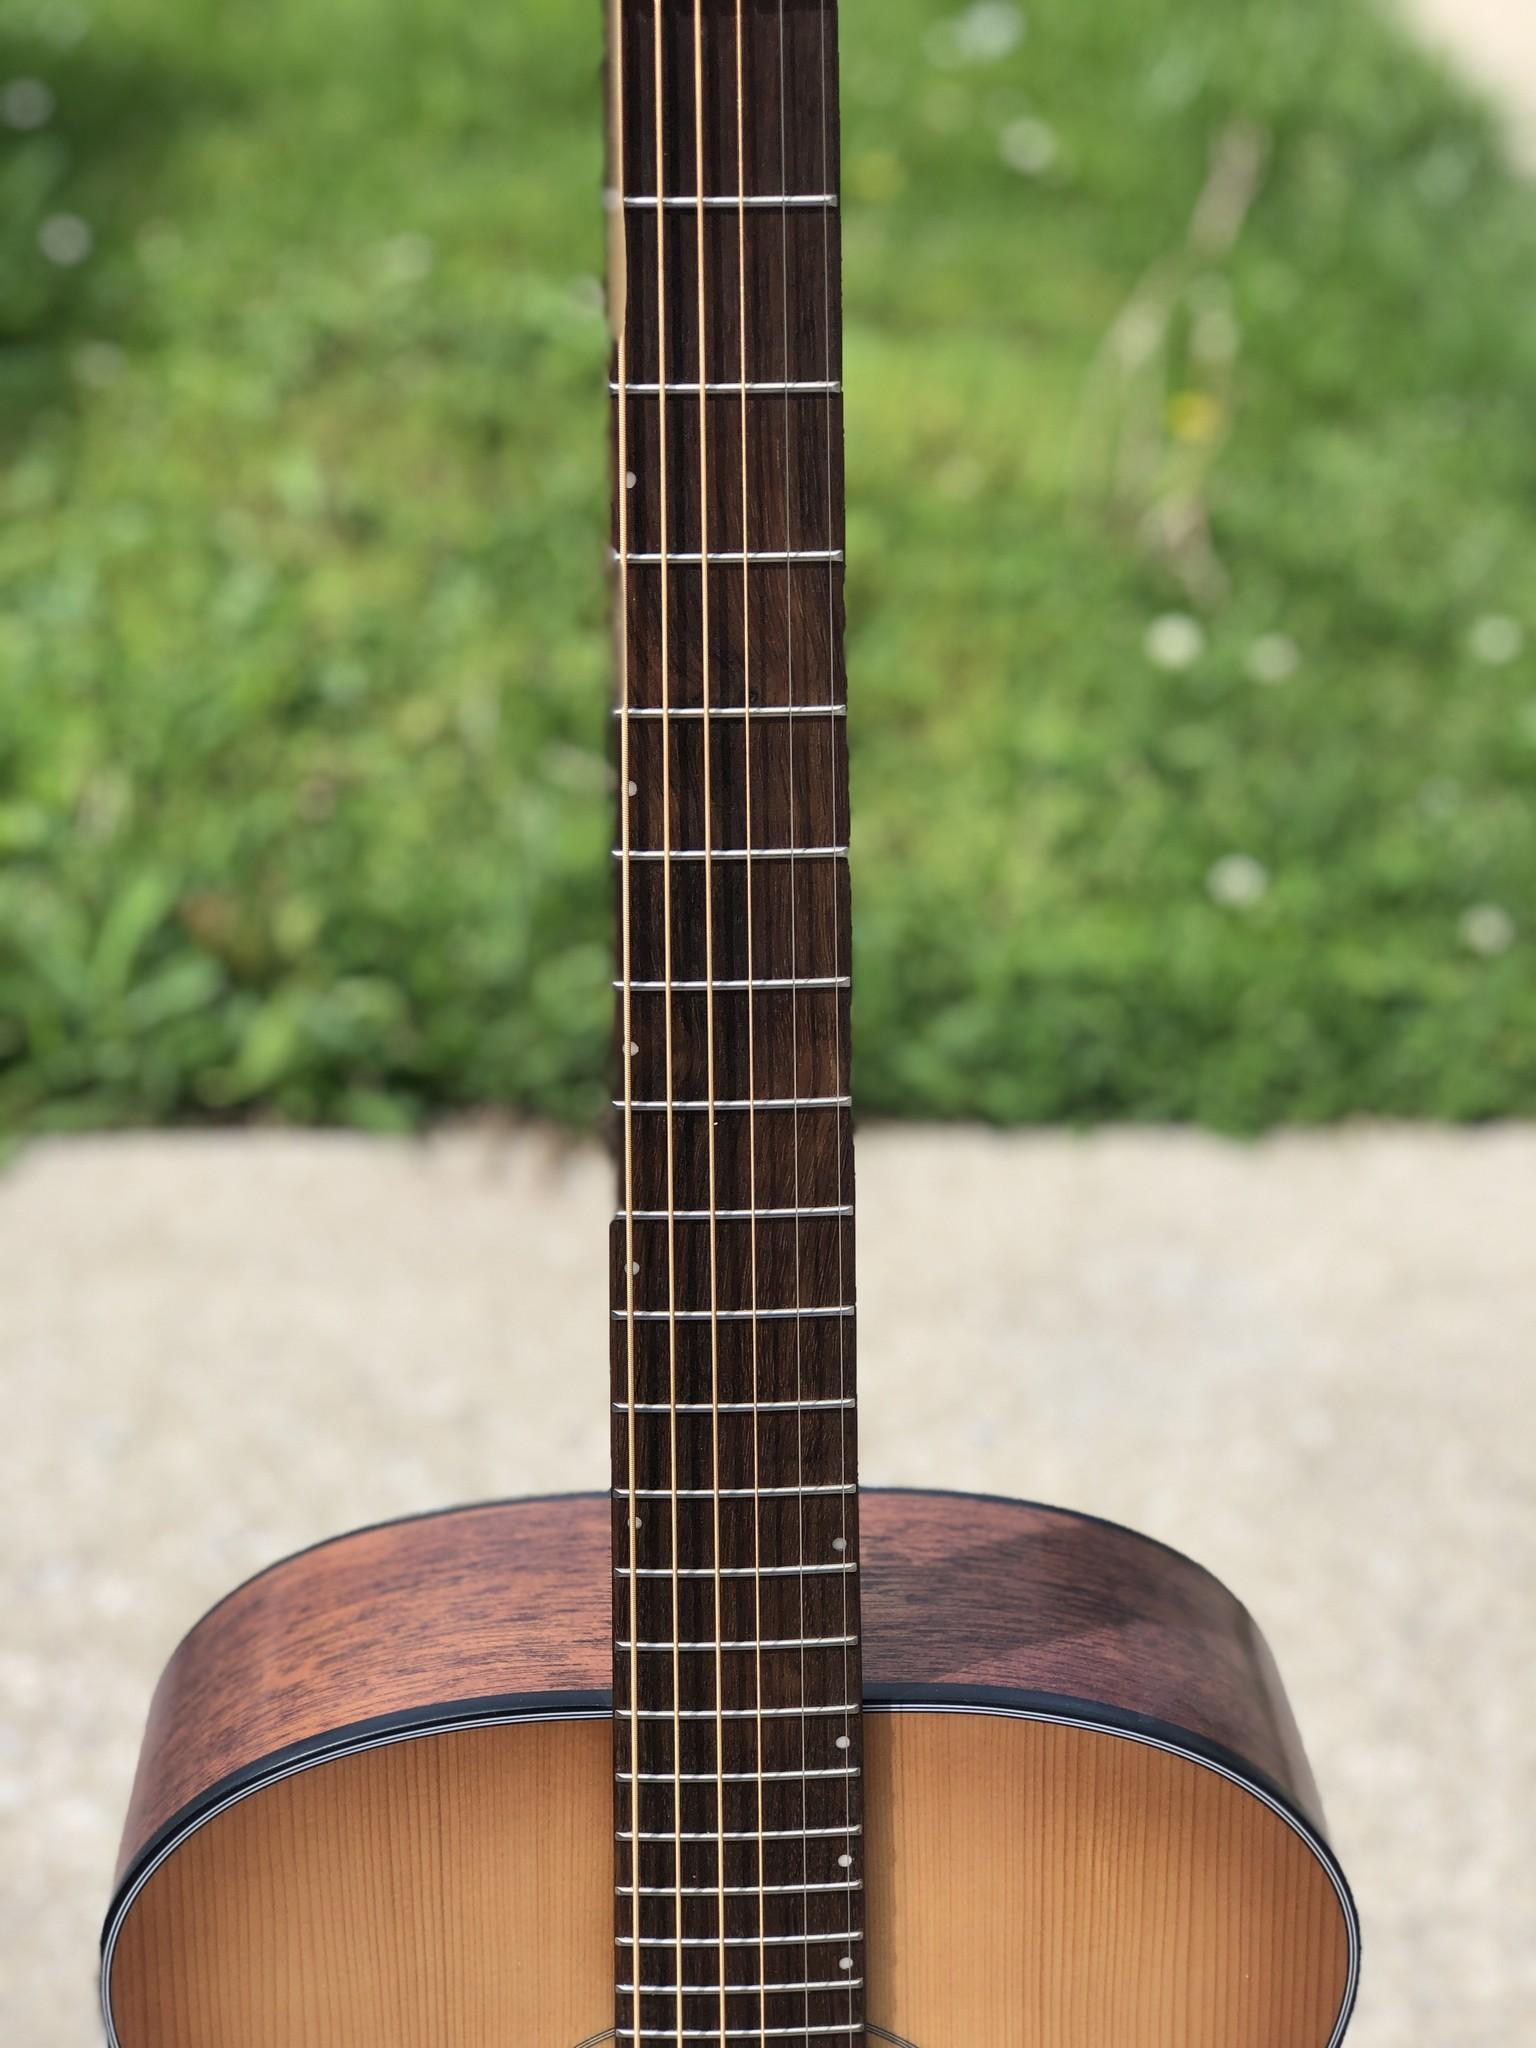 Breedlove Guitars Signature Concert Copper E Acoustic Electric-3